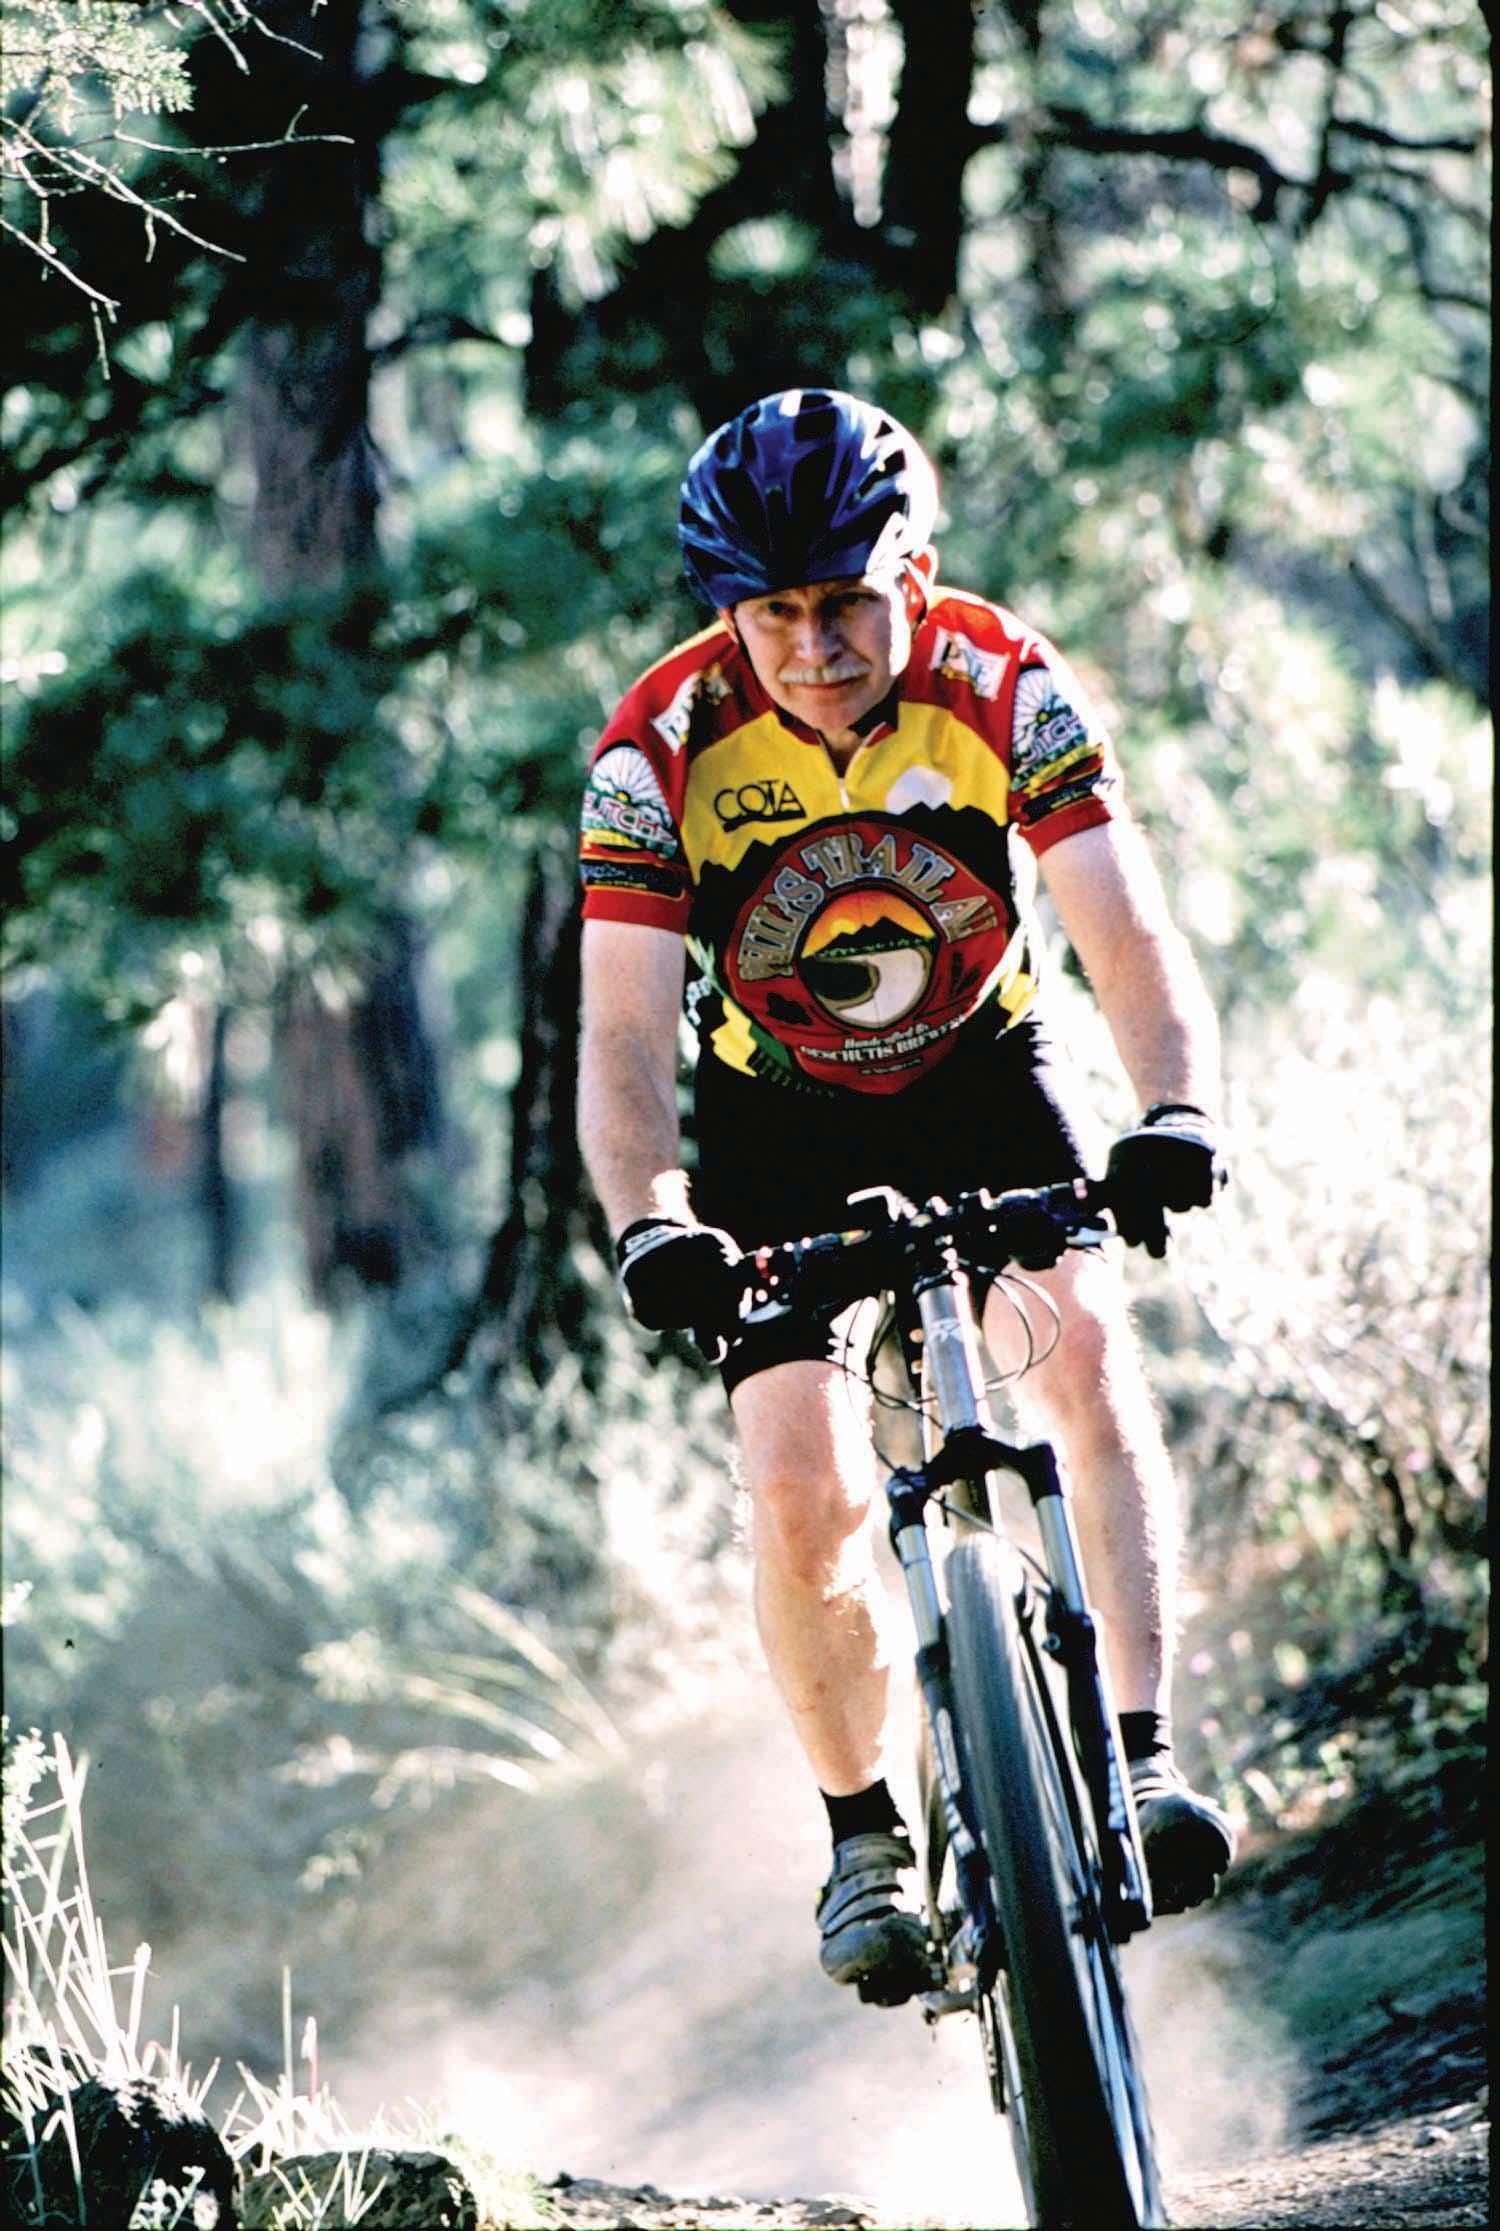 Phil_Meglasson_-rides_his_prized_creation_Mrazek_Trail_2005_RF_PC_Bob_Woodward.jpg